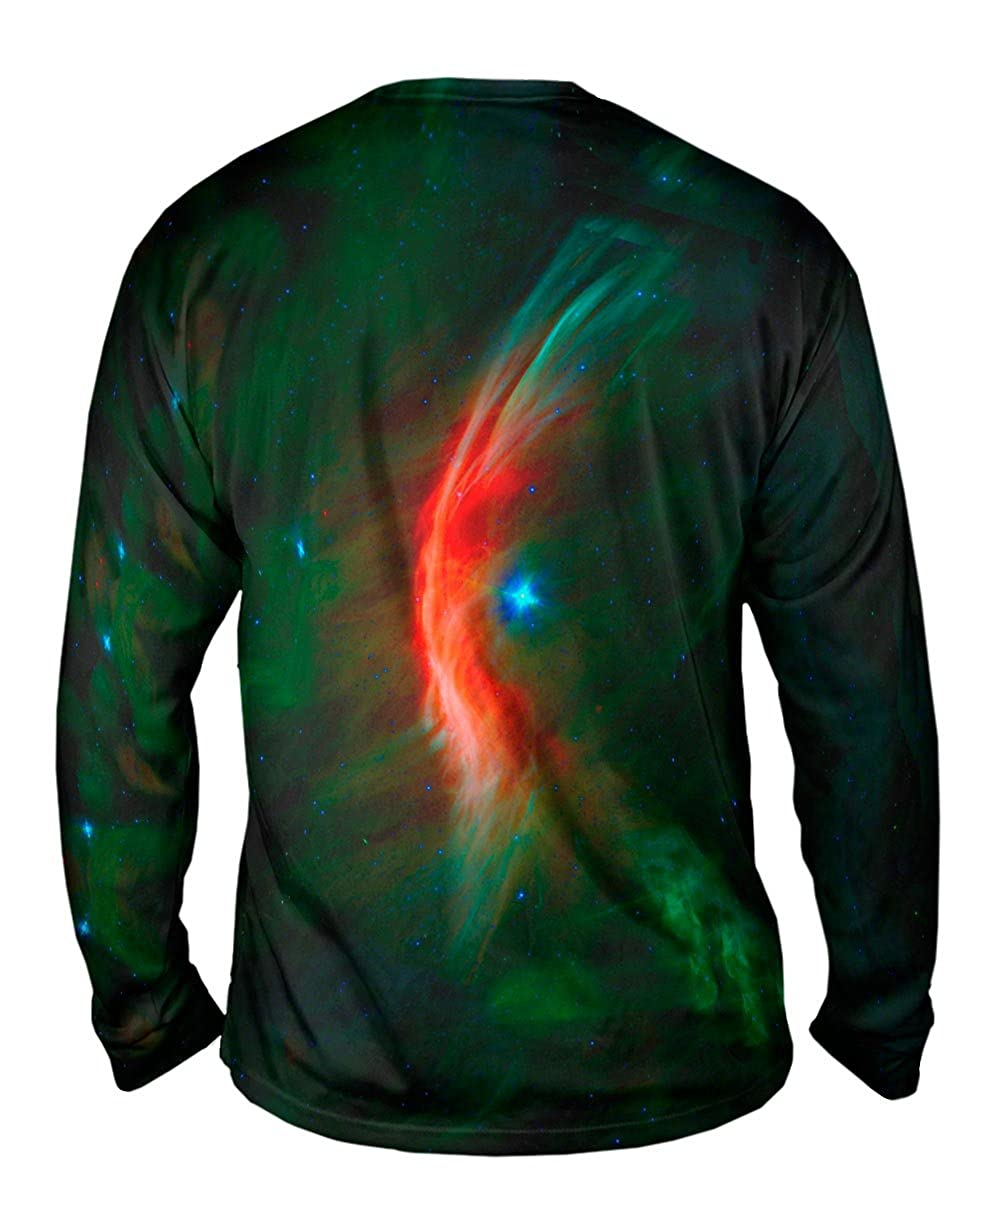 Space Galaxy Zeta Opiuchi Mens Long Sleeve Yizzam TShirt